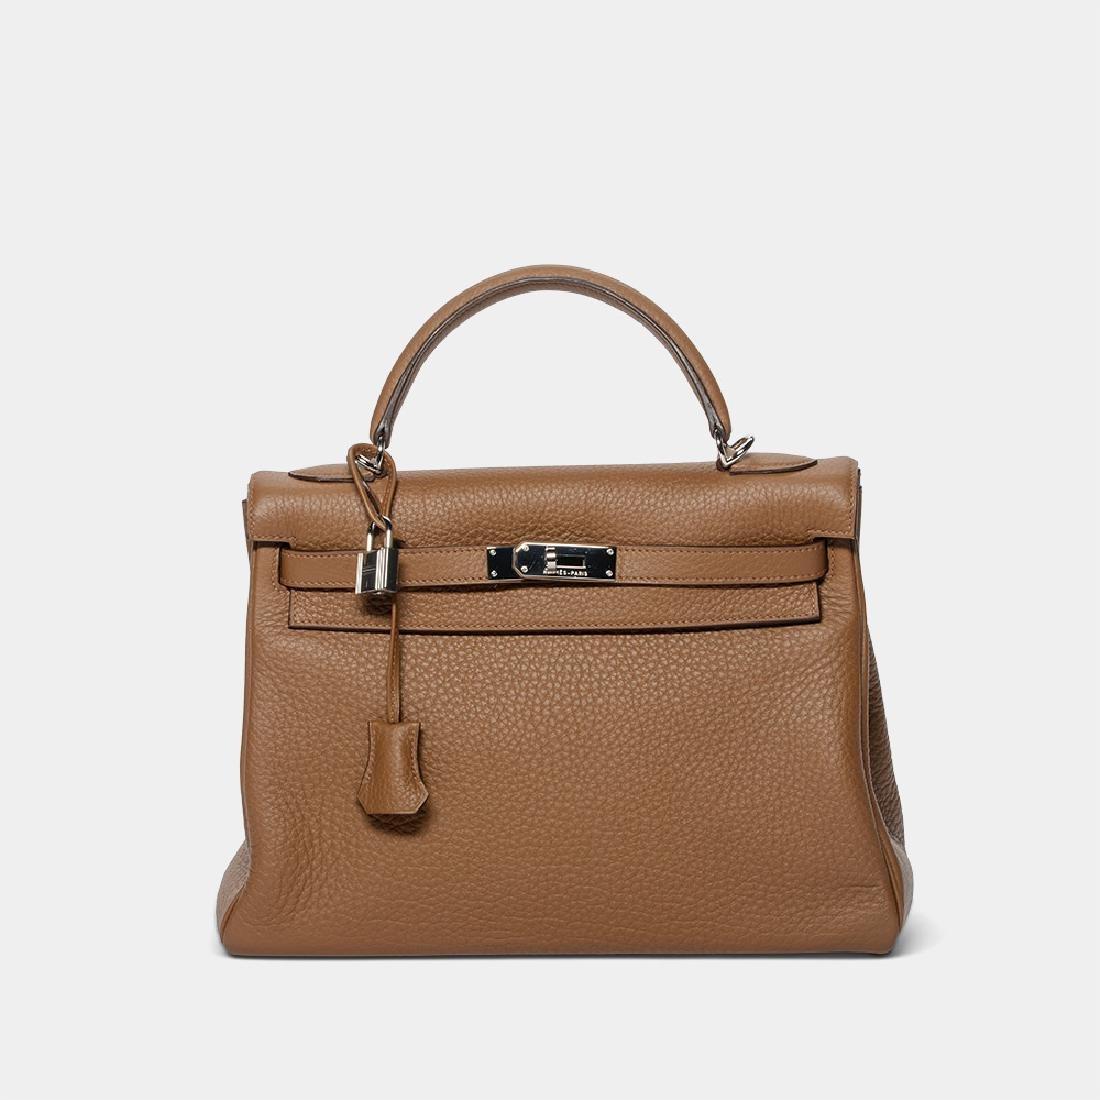 "HERMÈS beliebte Stil-Ikonen Handtasche ""RETOURNE KELLY"